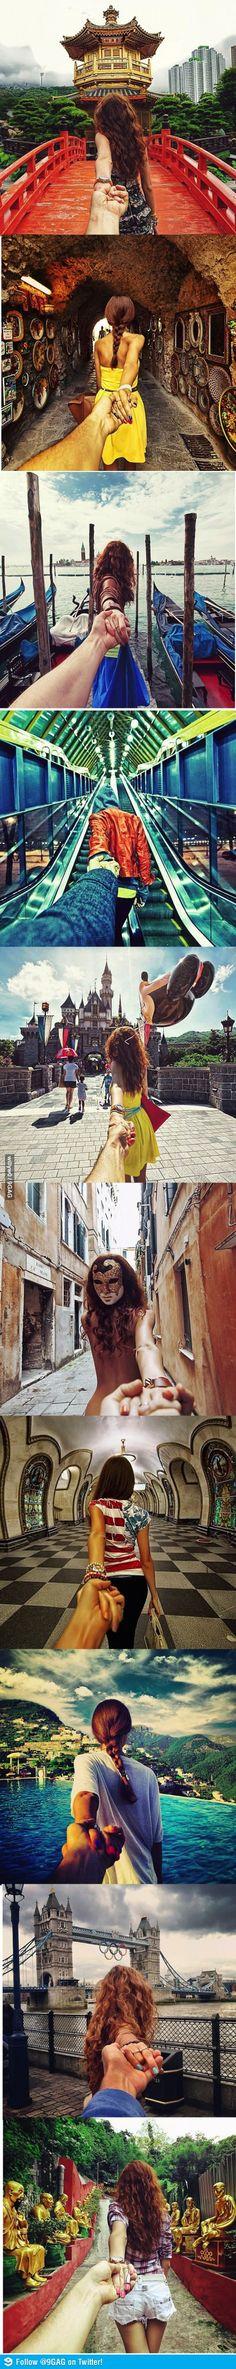 Photographer's girlfriend leads him around the world